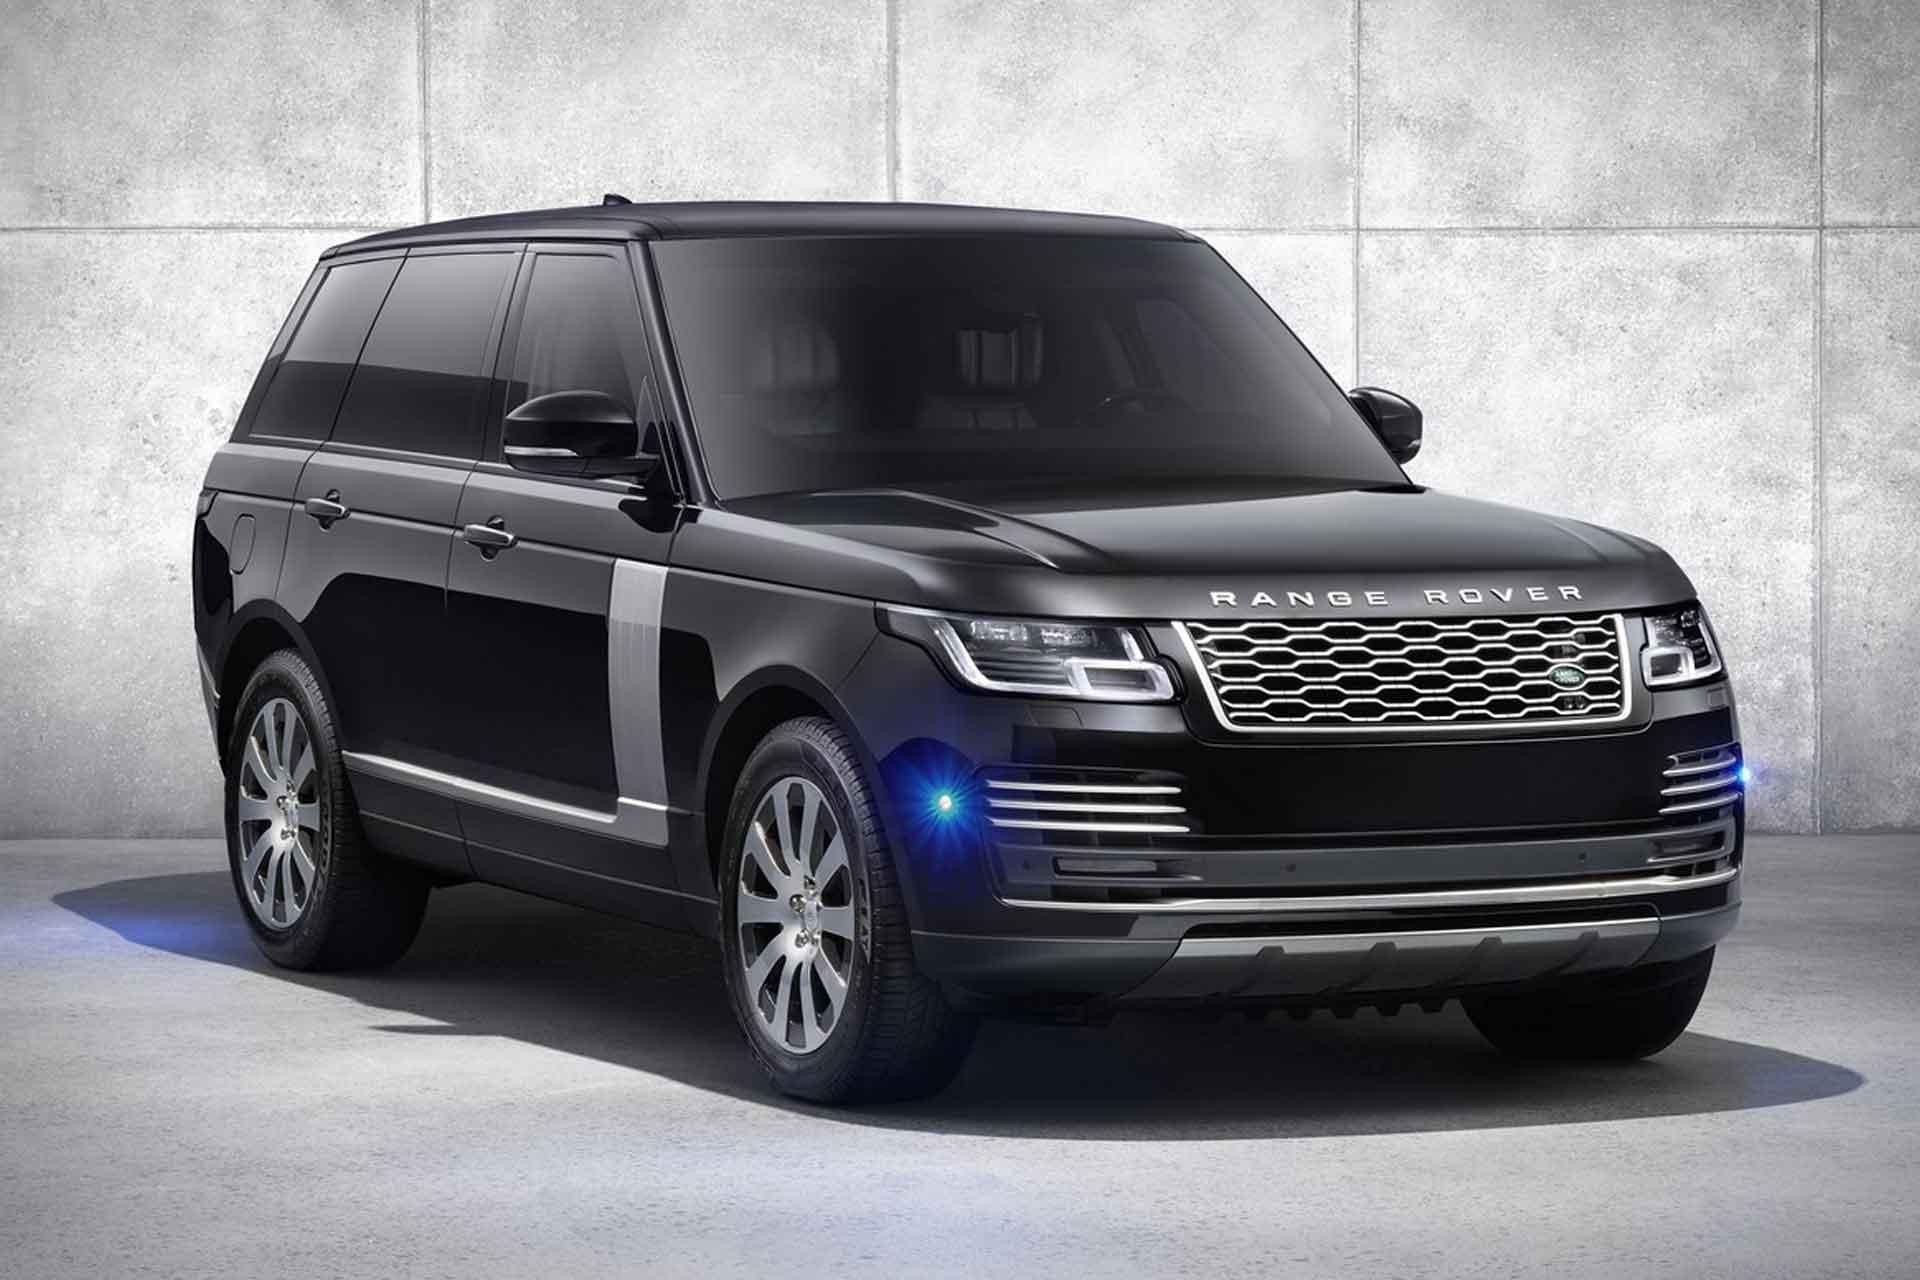 2020 Range Rover Sentinel Armored SUV | Uncrate